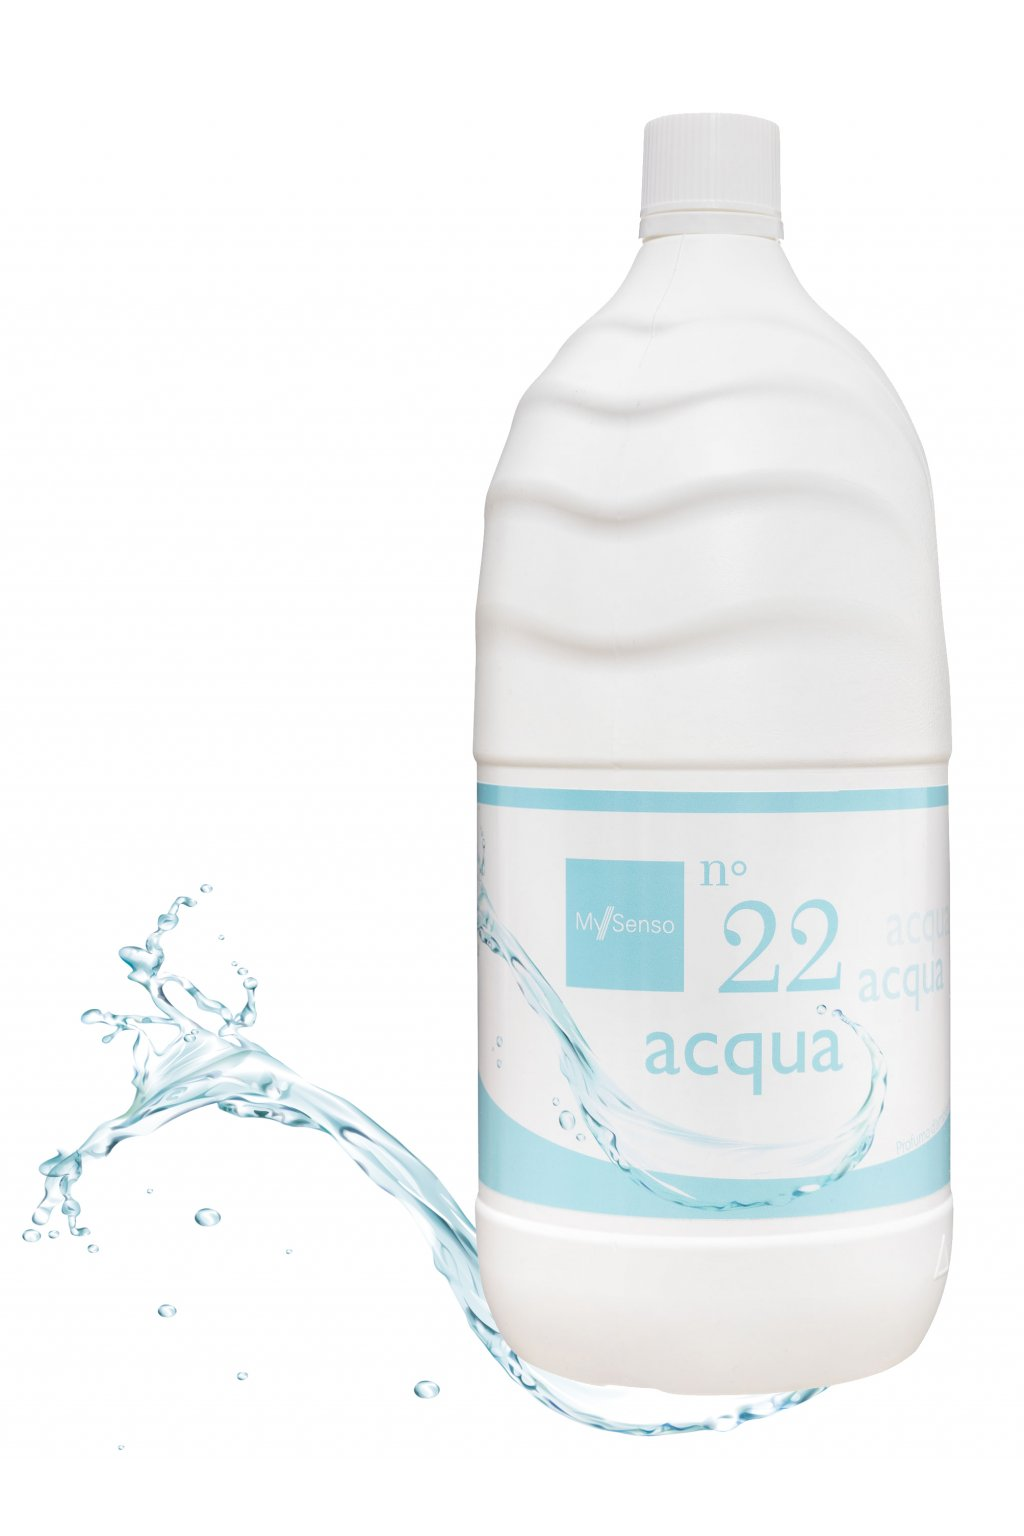 207 my senso nahradni napln pro aromaticky difuzer n 22 acqua vune more 2000ml